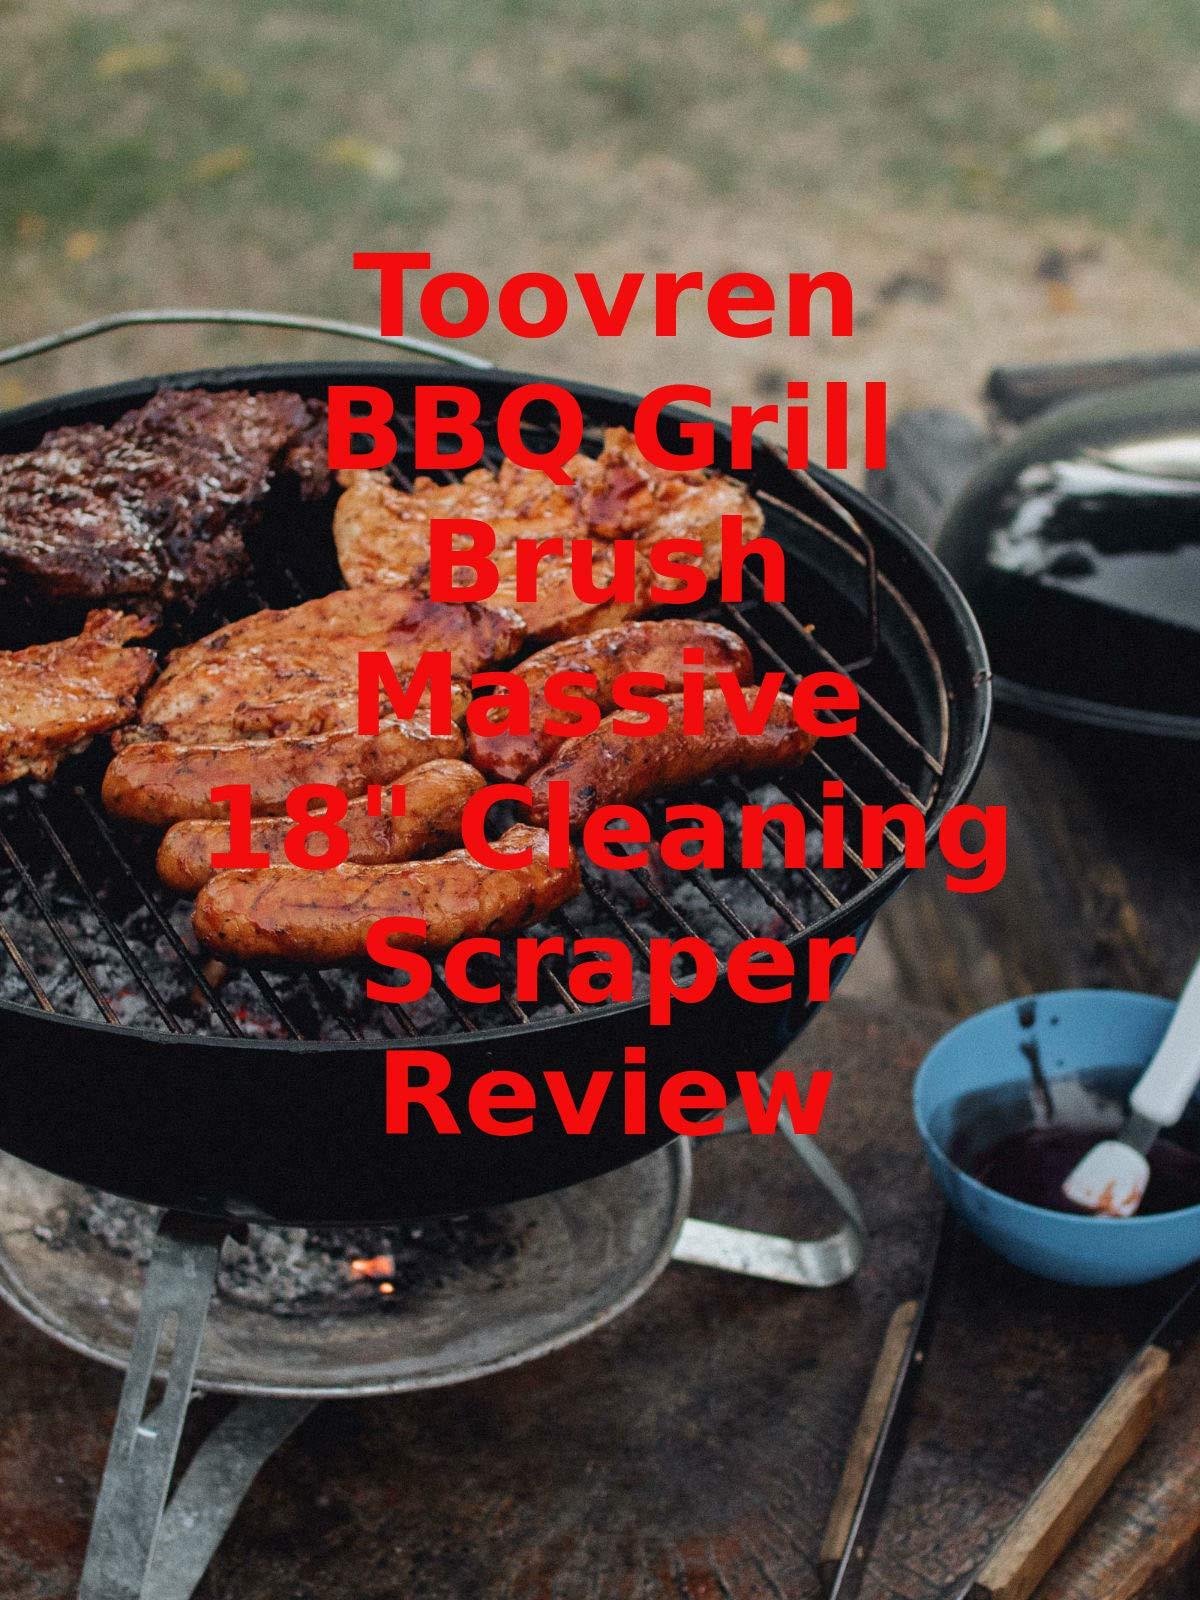 Review: Toovren BBQ Grill Brush Massive 18